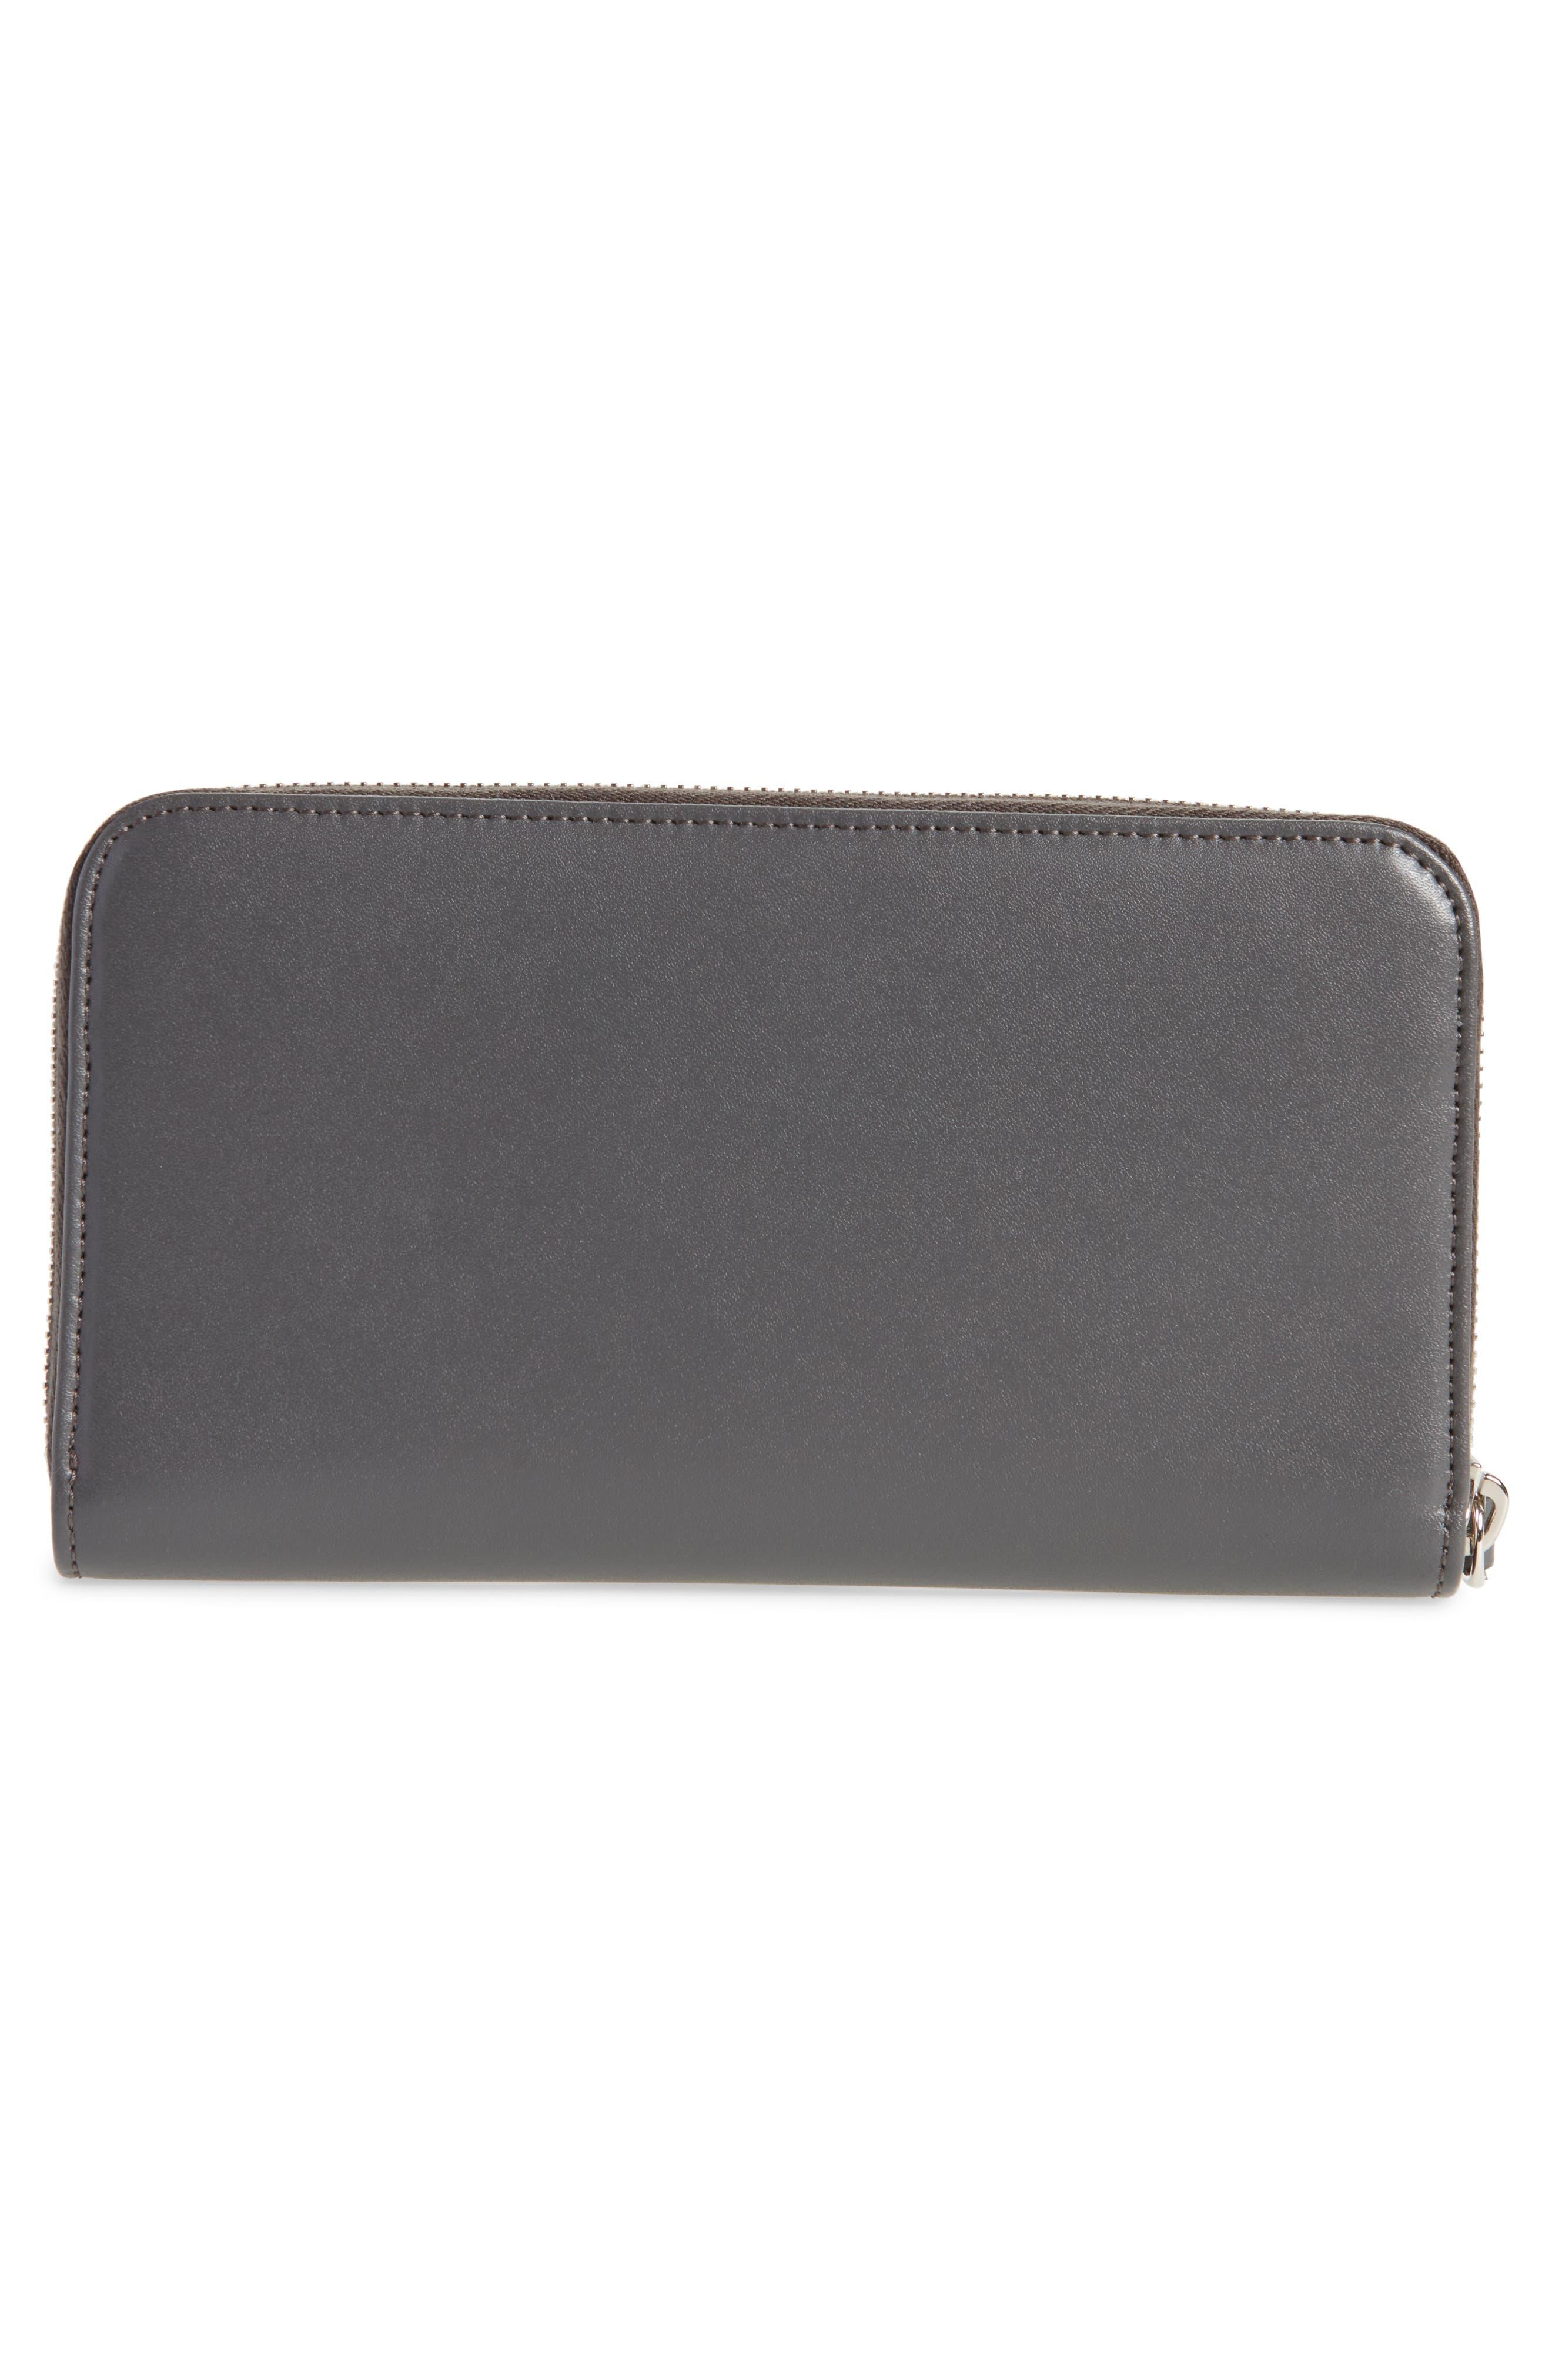 Studded Calfskin Wallet,                             Alternate thumbnail 3, color,                             086